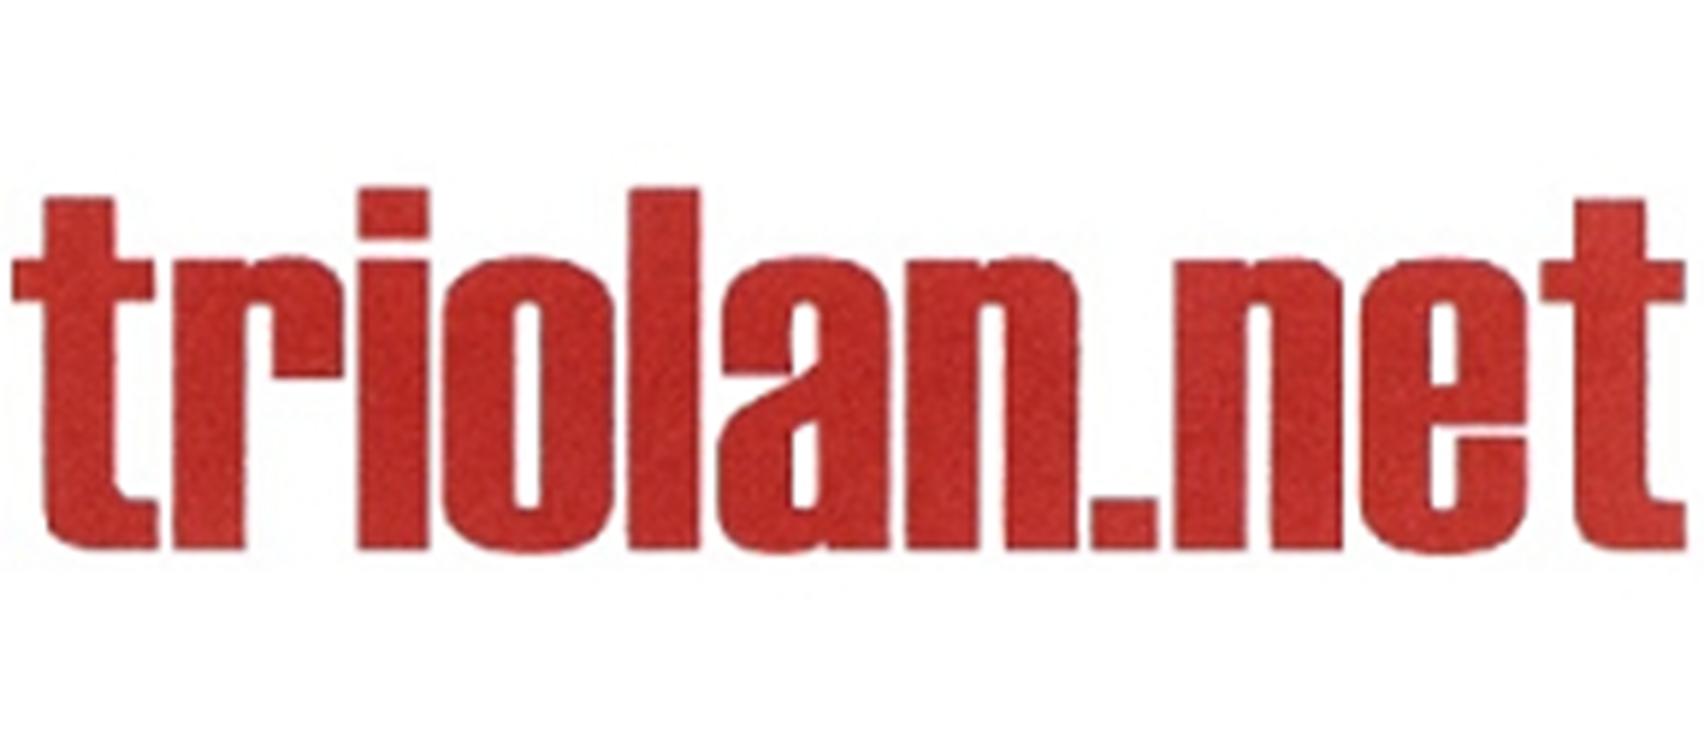 Triolan.net